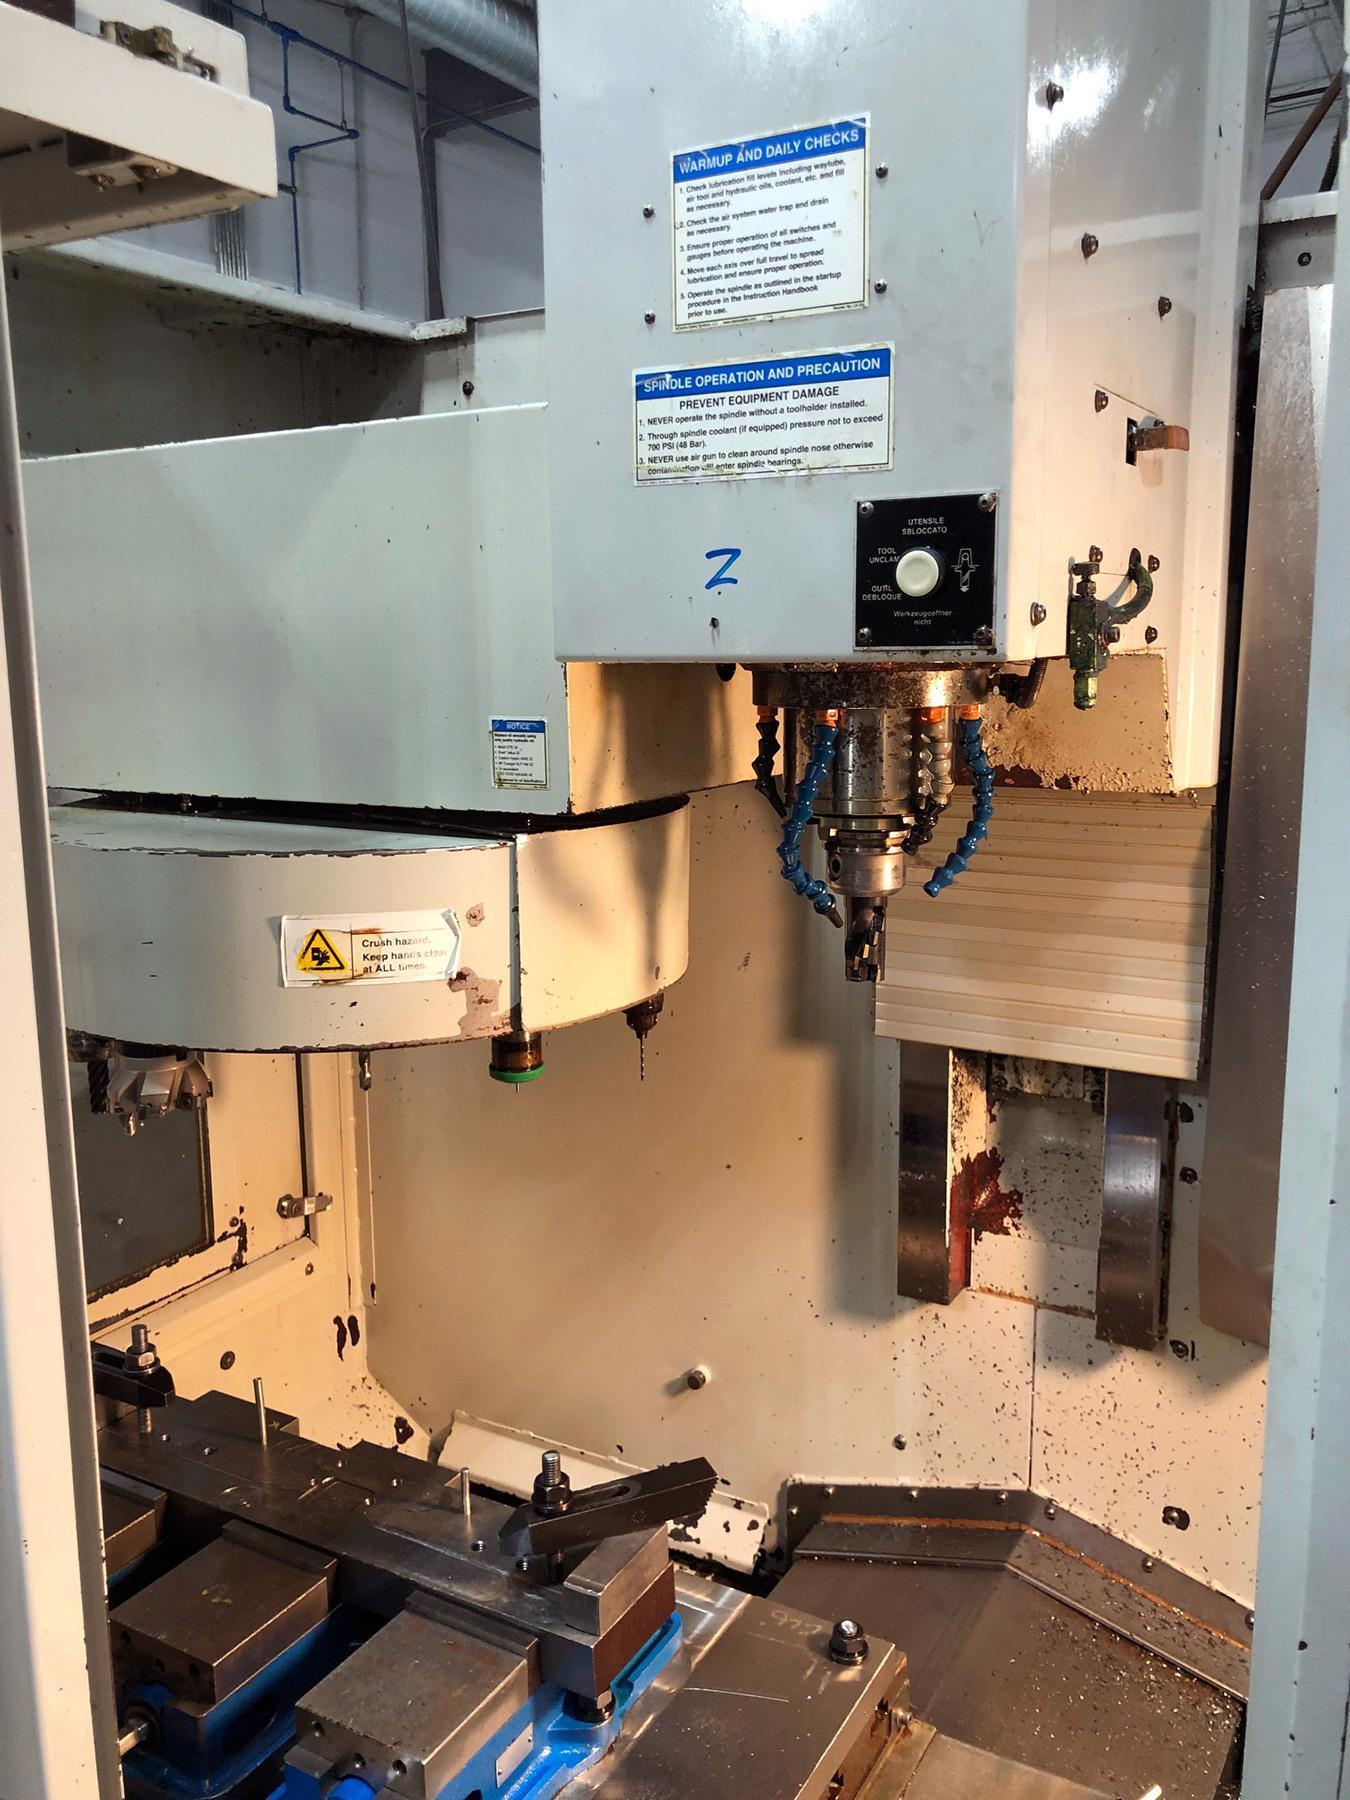 USED, MILLTRONICS MODEL RW15 SERIES C CNC VERTICAL MACHINING CENTER